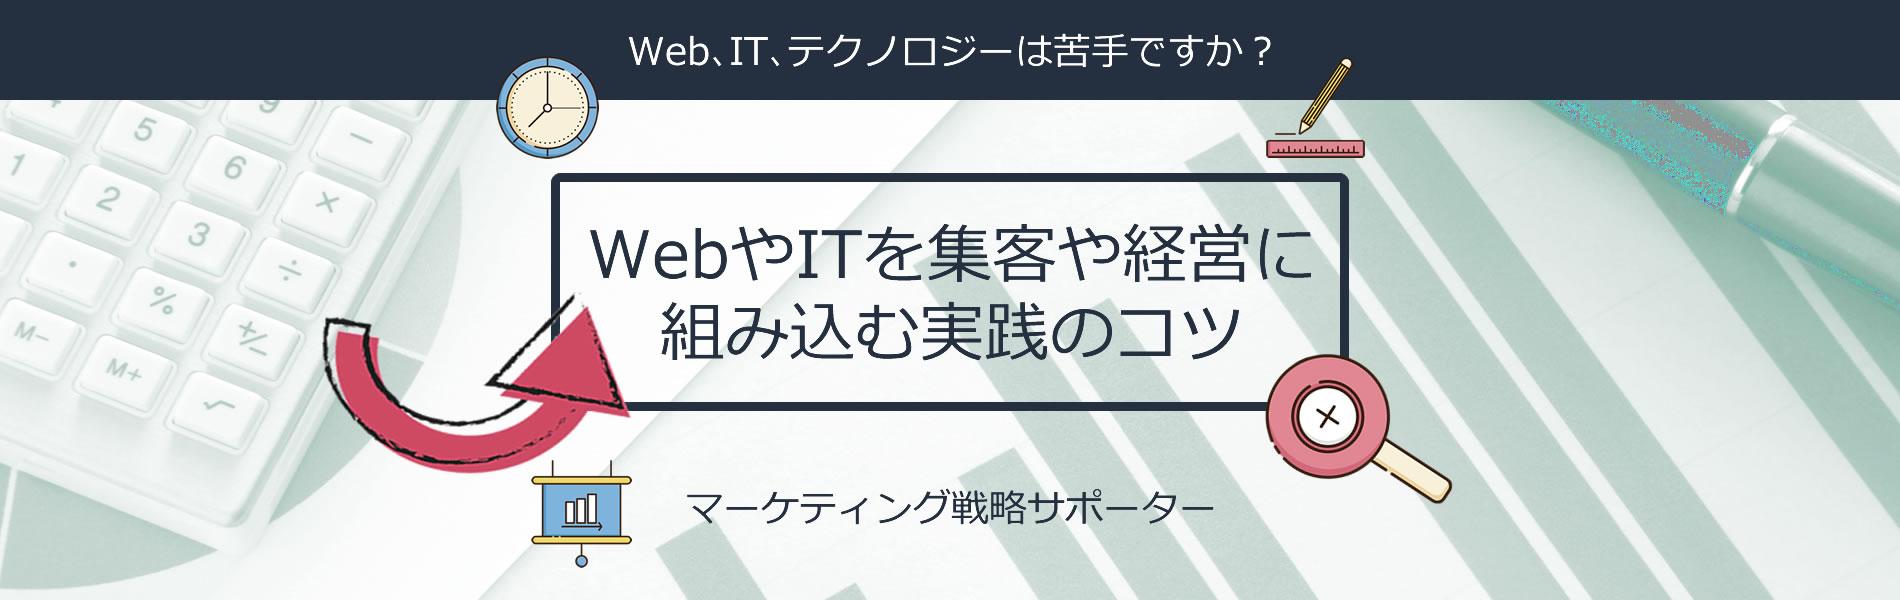 Webが苦手な社長のためのネット戦略研究所